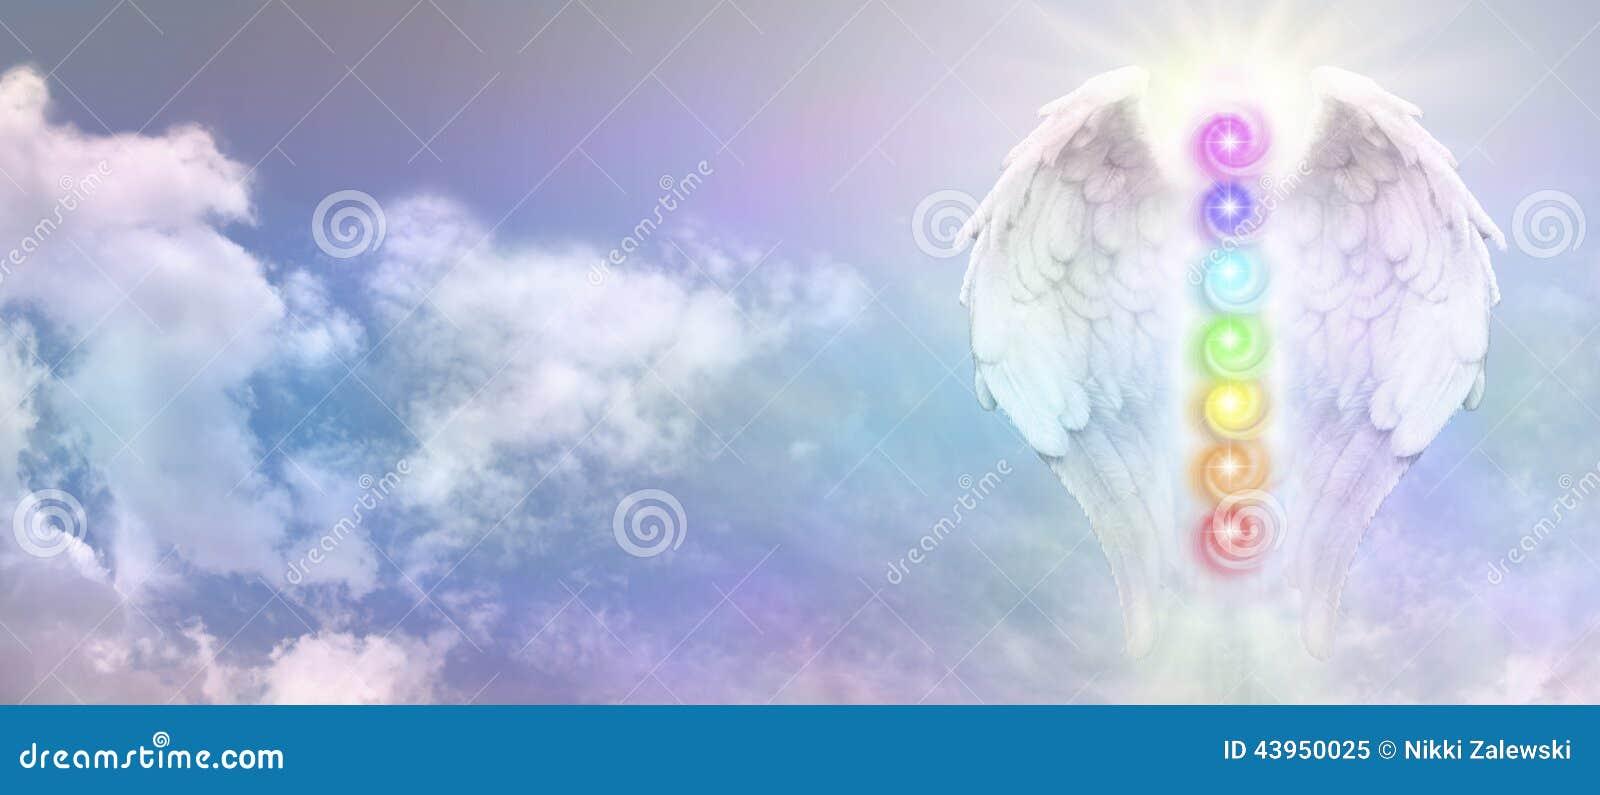 Angel reiki wings and seven chakra vortexes stock image image angel reiki wings and seven chakra vortexes biocorpaavc